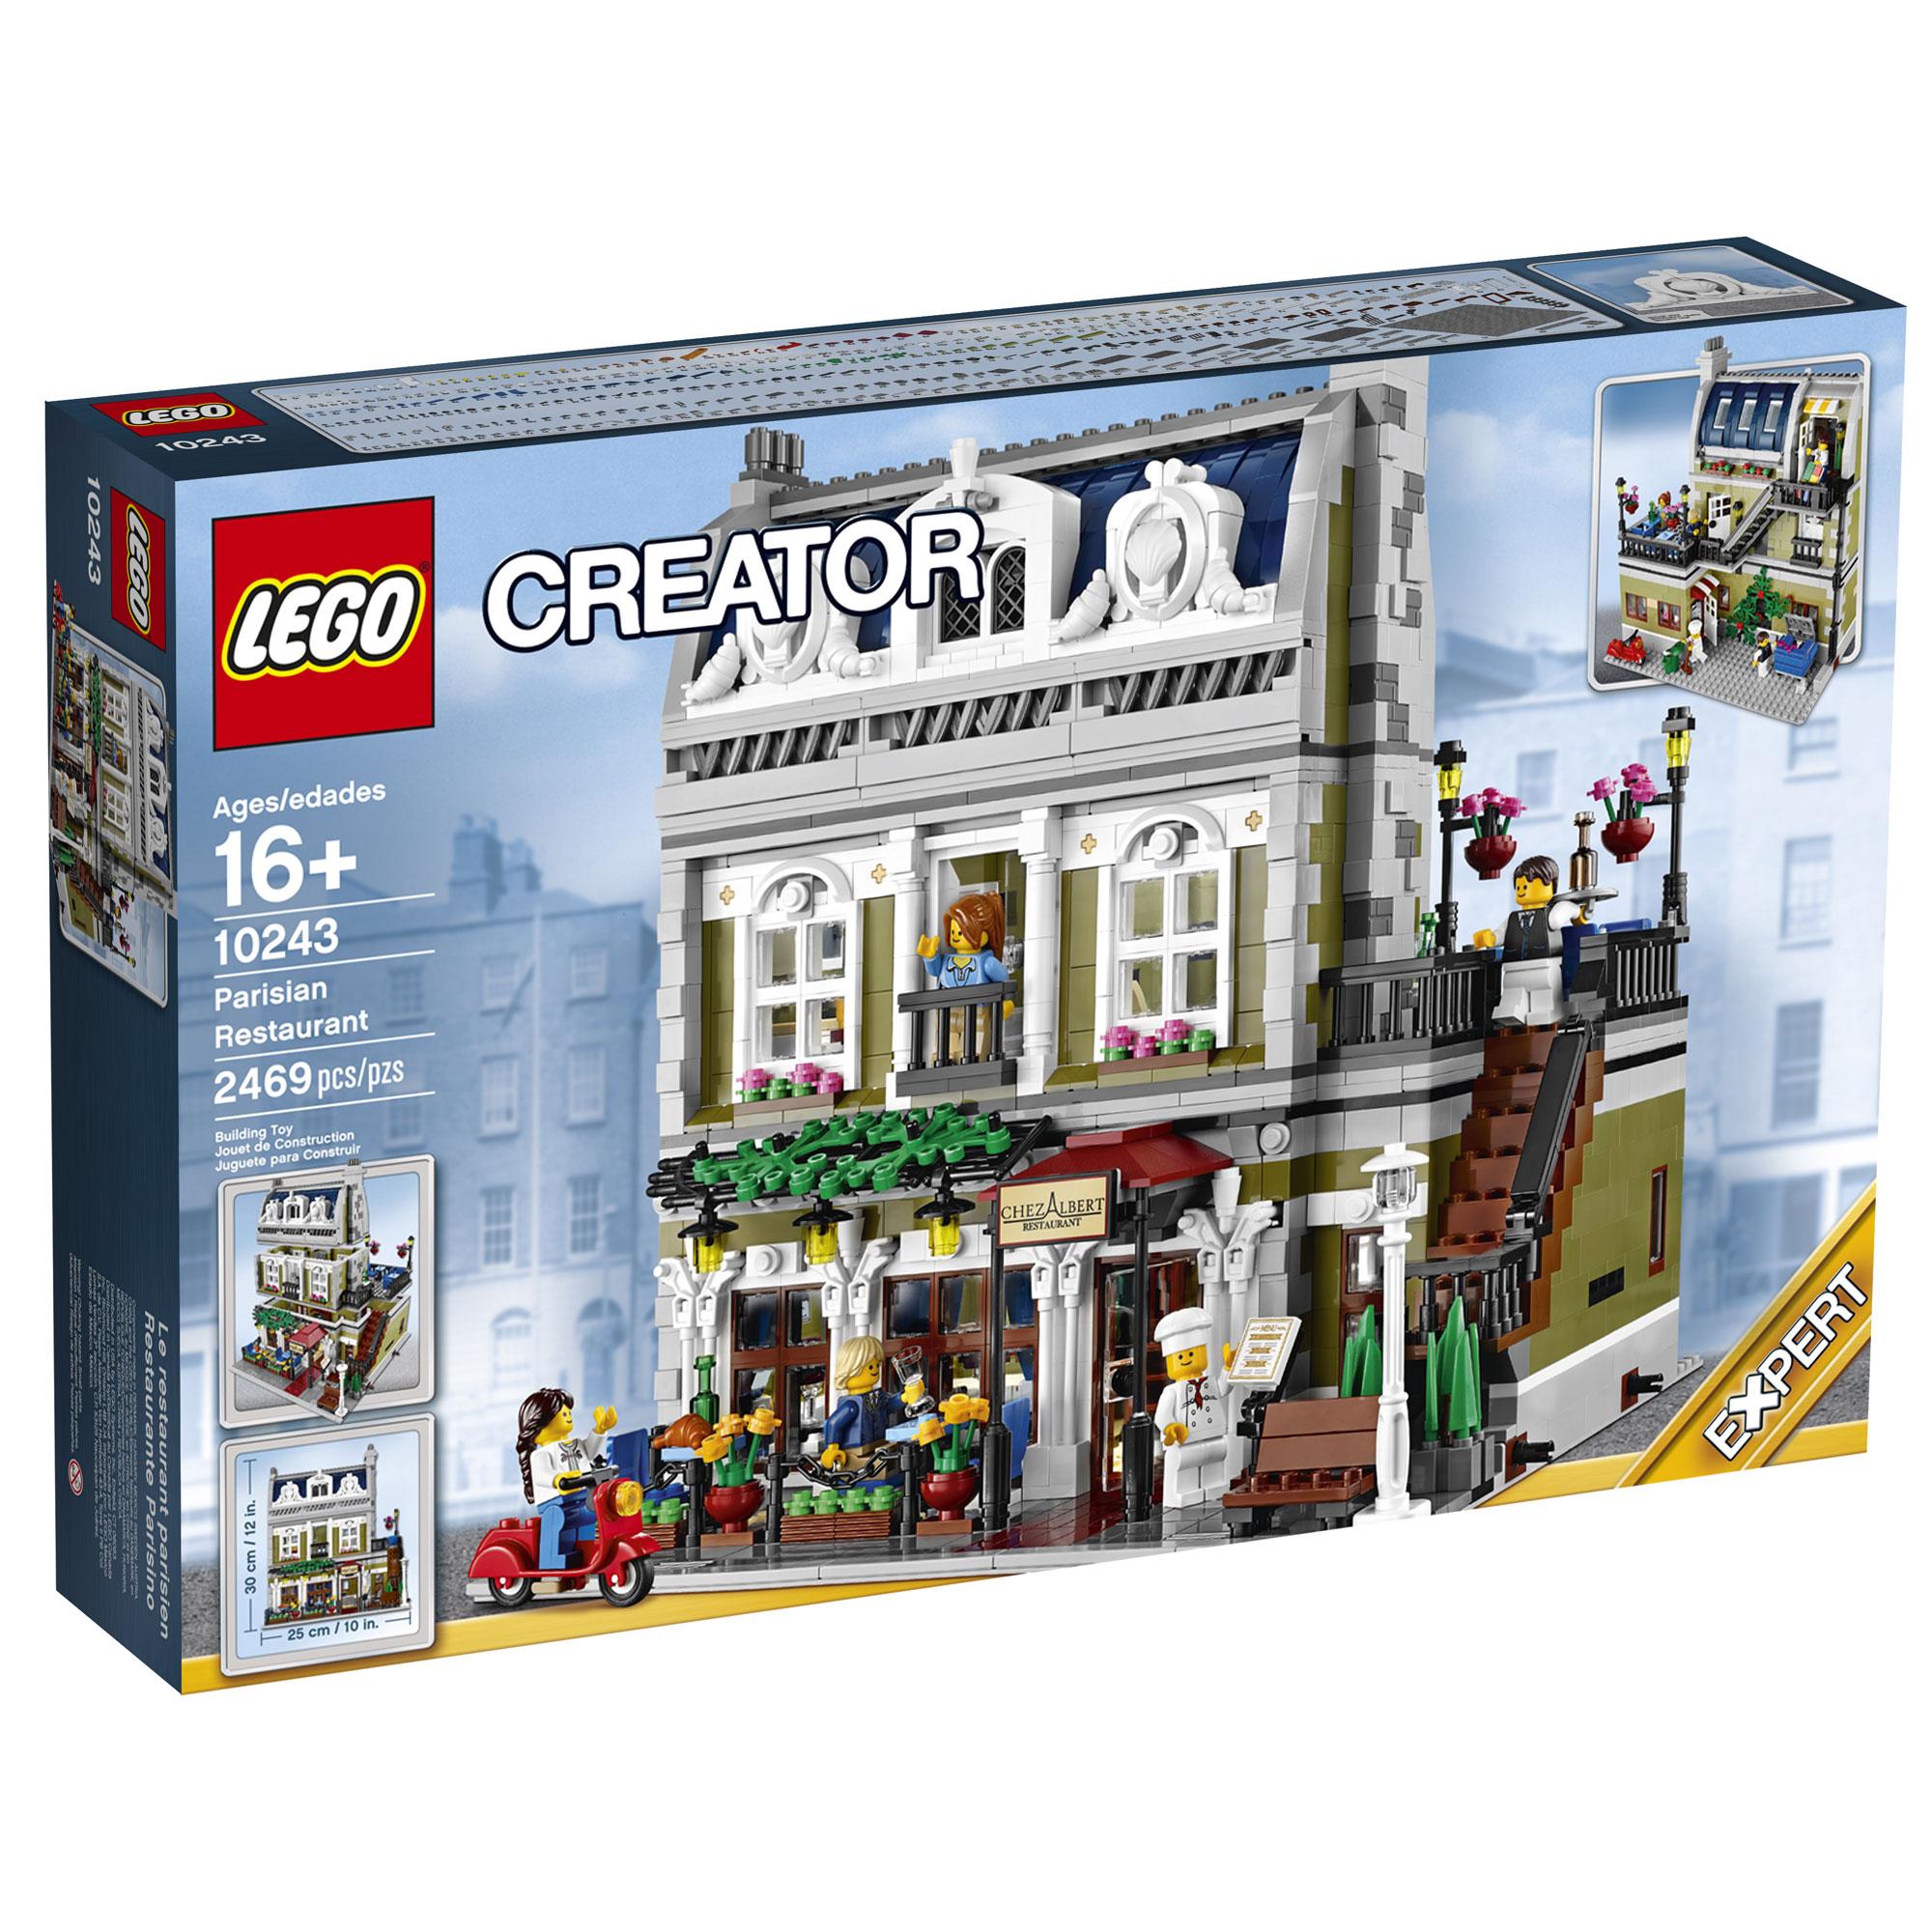 lego creator expert 10243 parisian restaurant brickextra. Black Bedroom Furniture Sets. Home Design Ideas